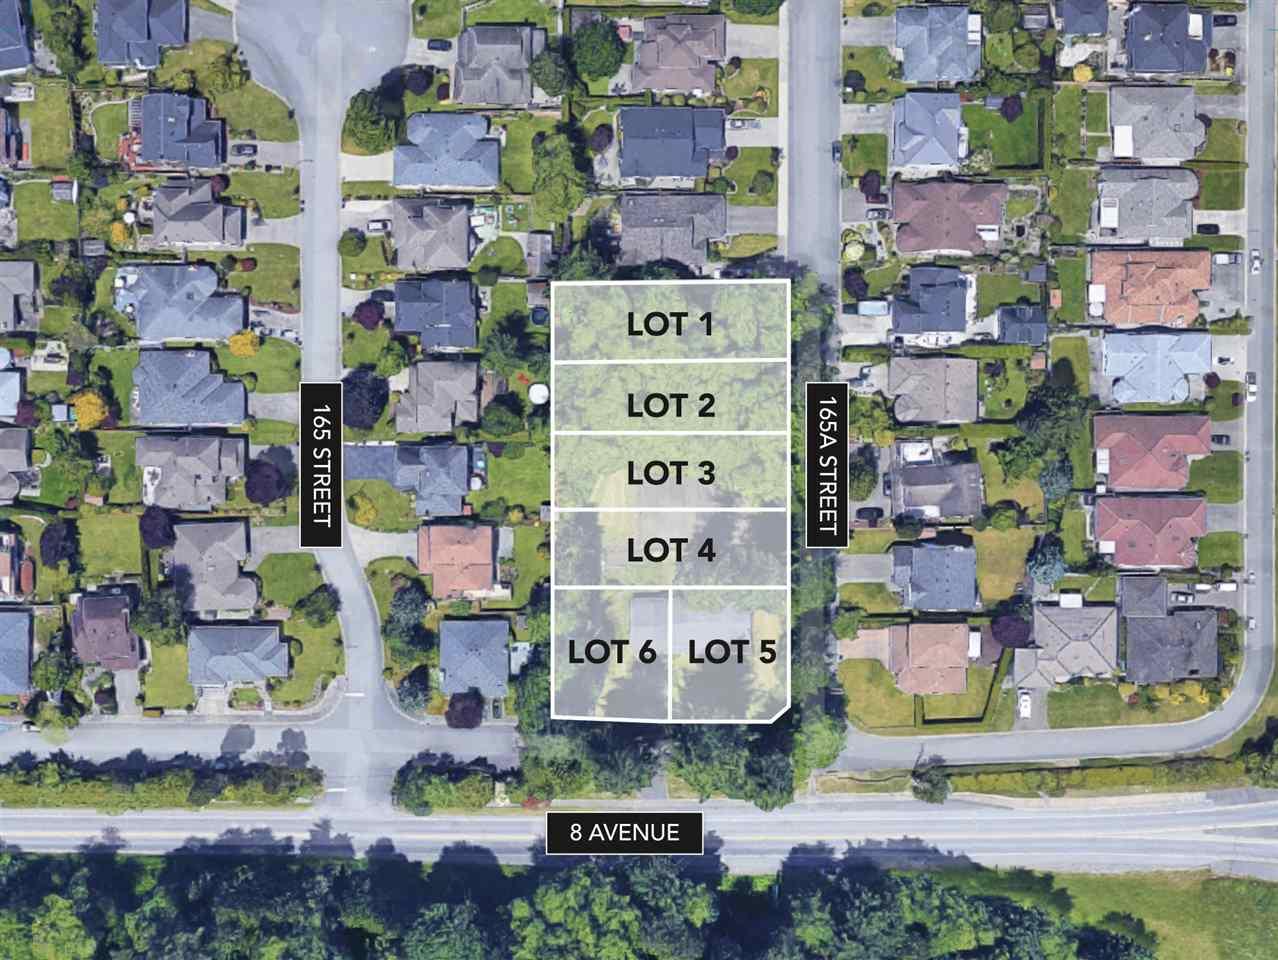 Buliding: 16537 8 Avenue, Surrey, BC